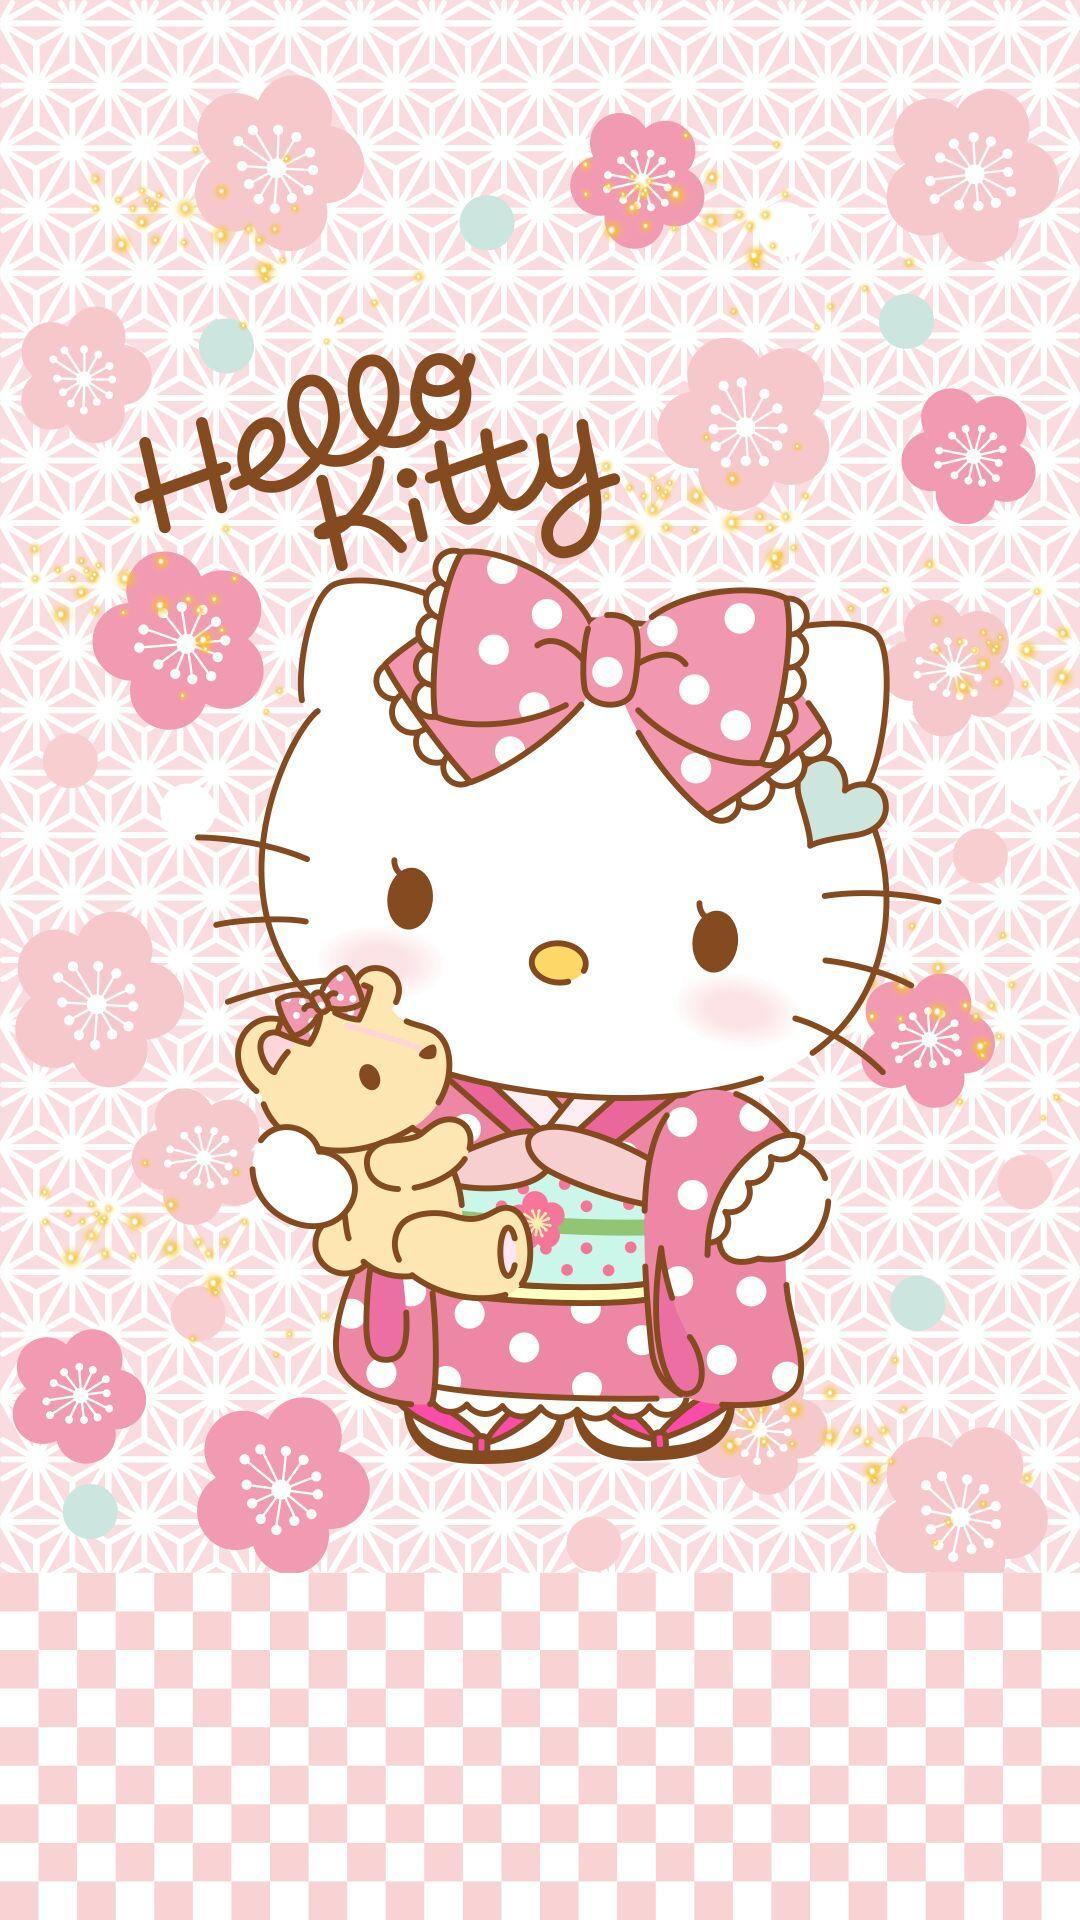 Amazing Wallpaper Hello Kitty Room - f5c72a654c528f73955b6de130208270  Photograph_591828.jpg